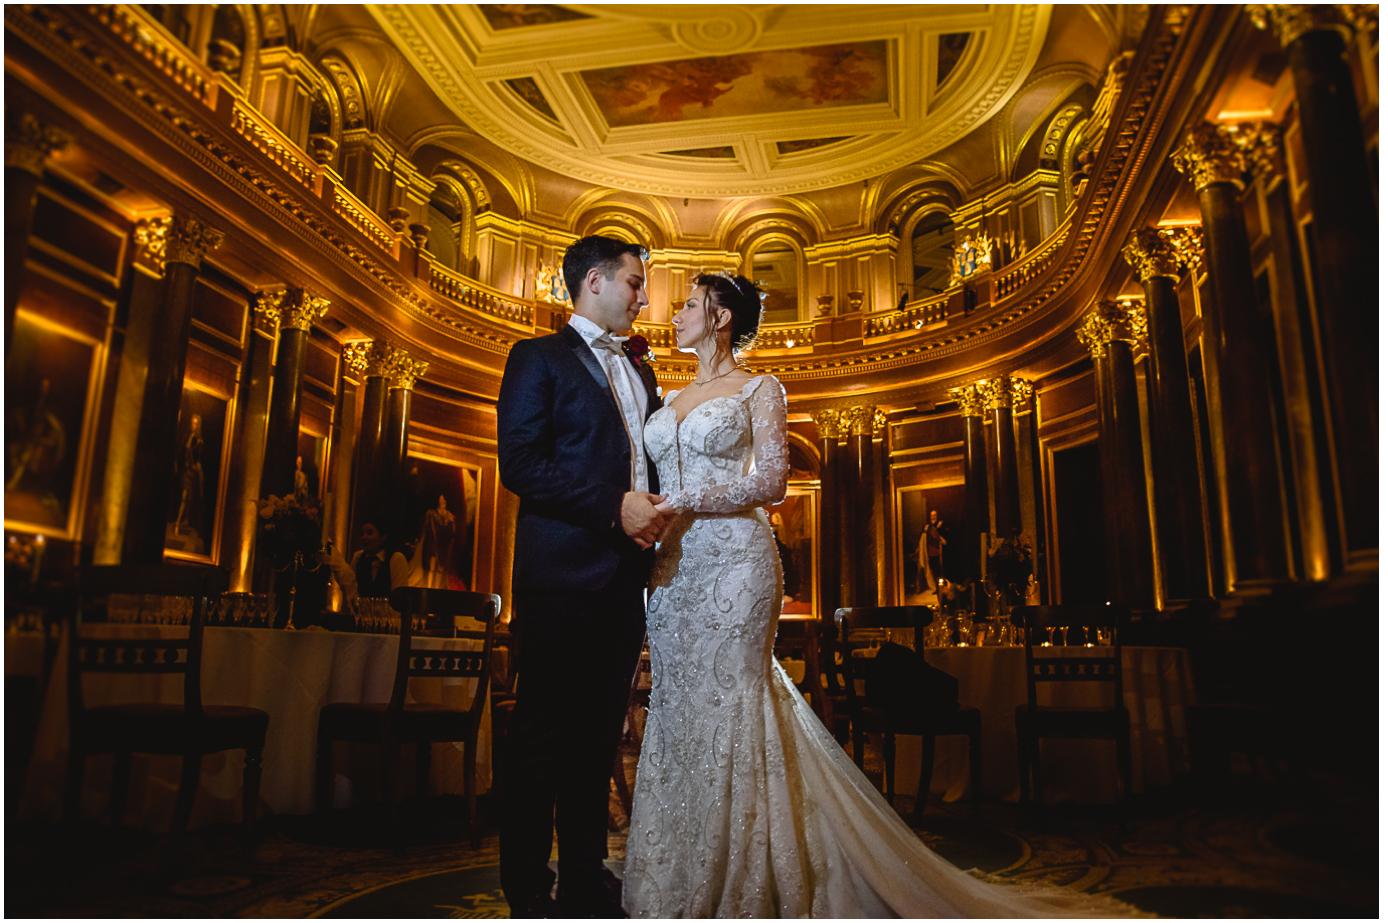 iranian wedding photographer 251 - Drapers Hall London Wedding Photographer